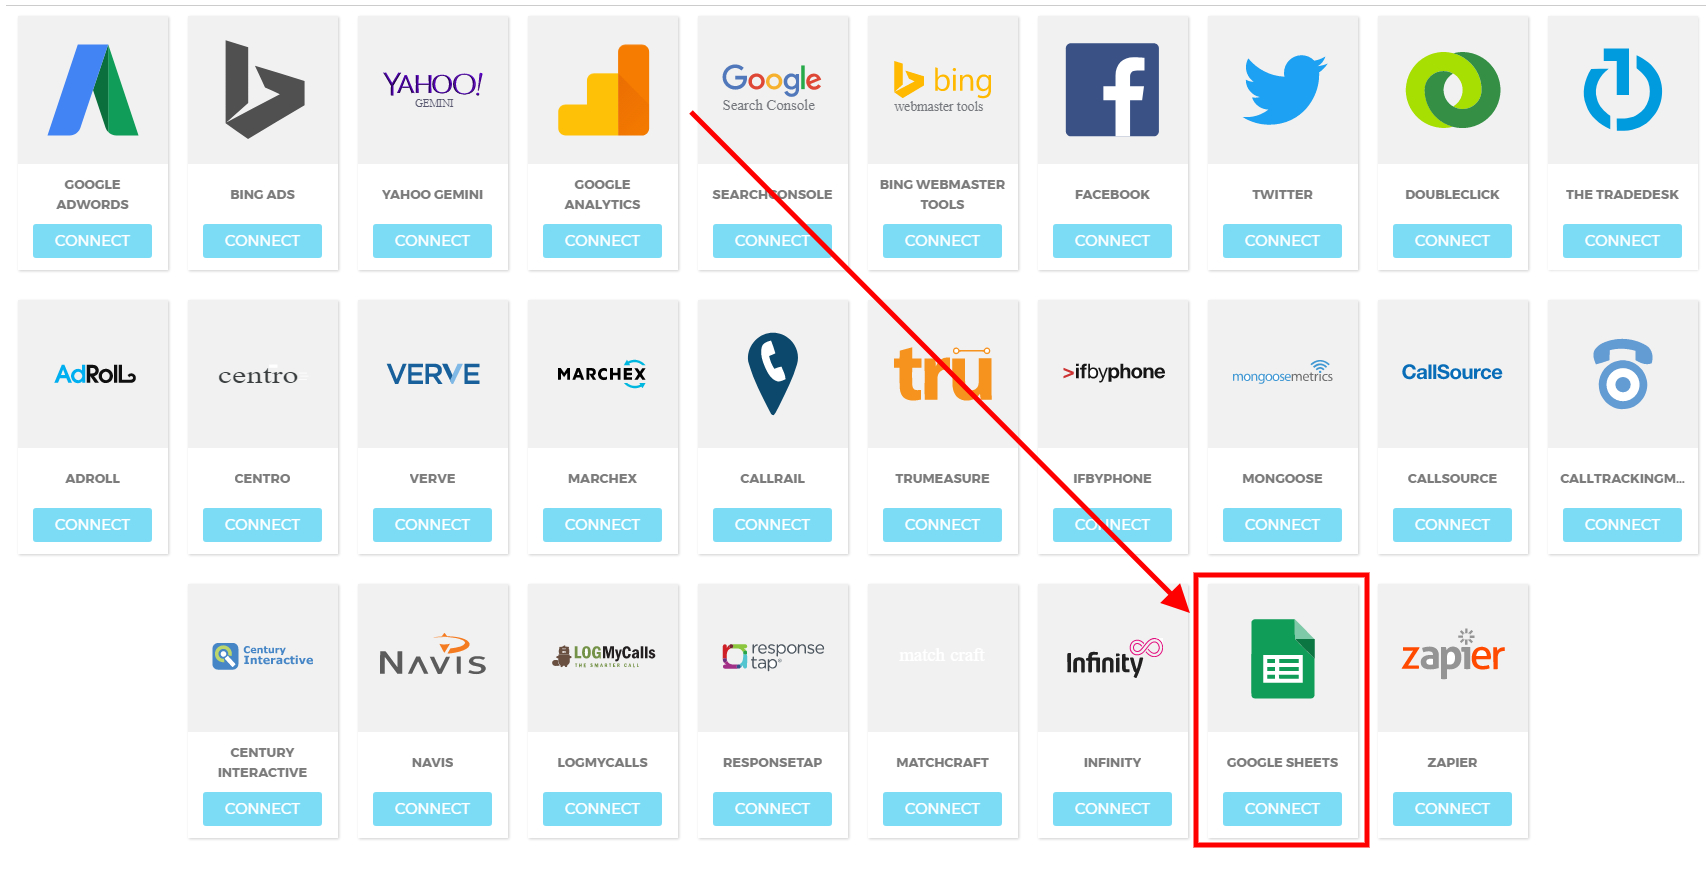 Google Spreadsheet Login Throughout Integrating With Google Sheets – Ninjacat Support